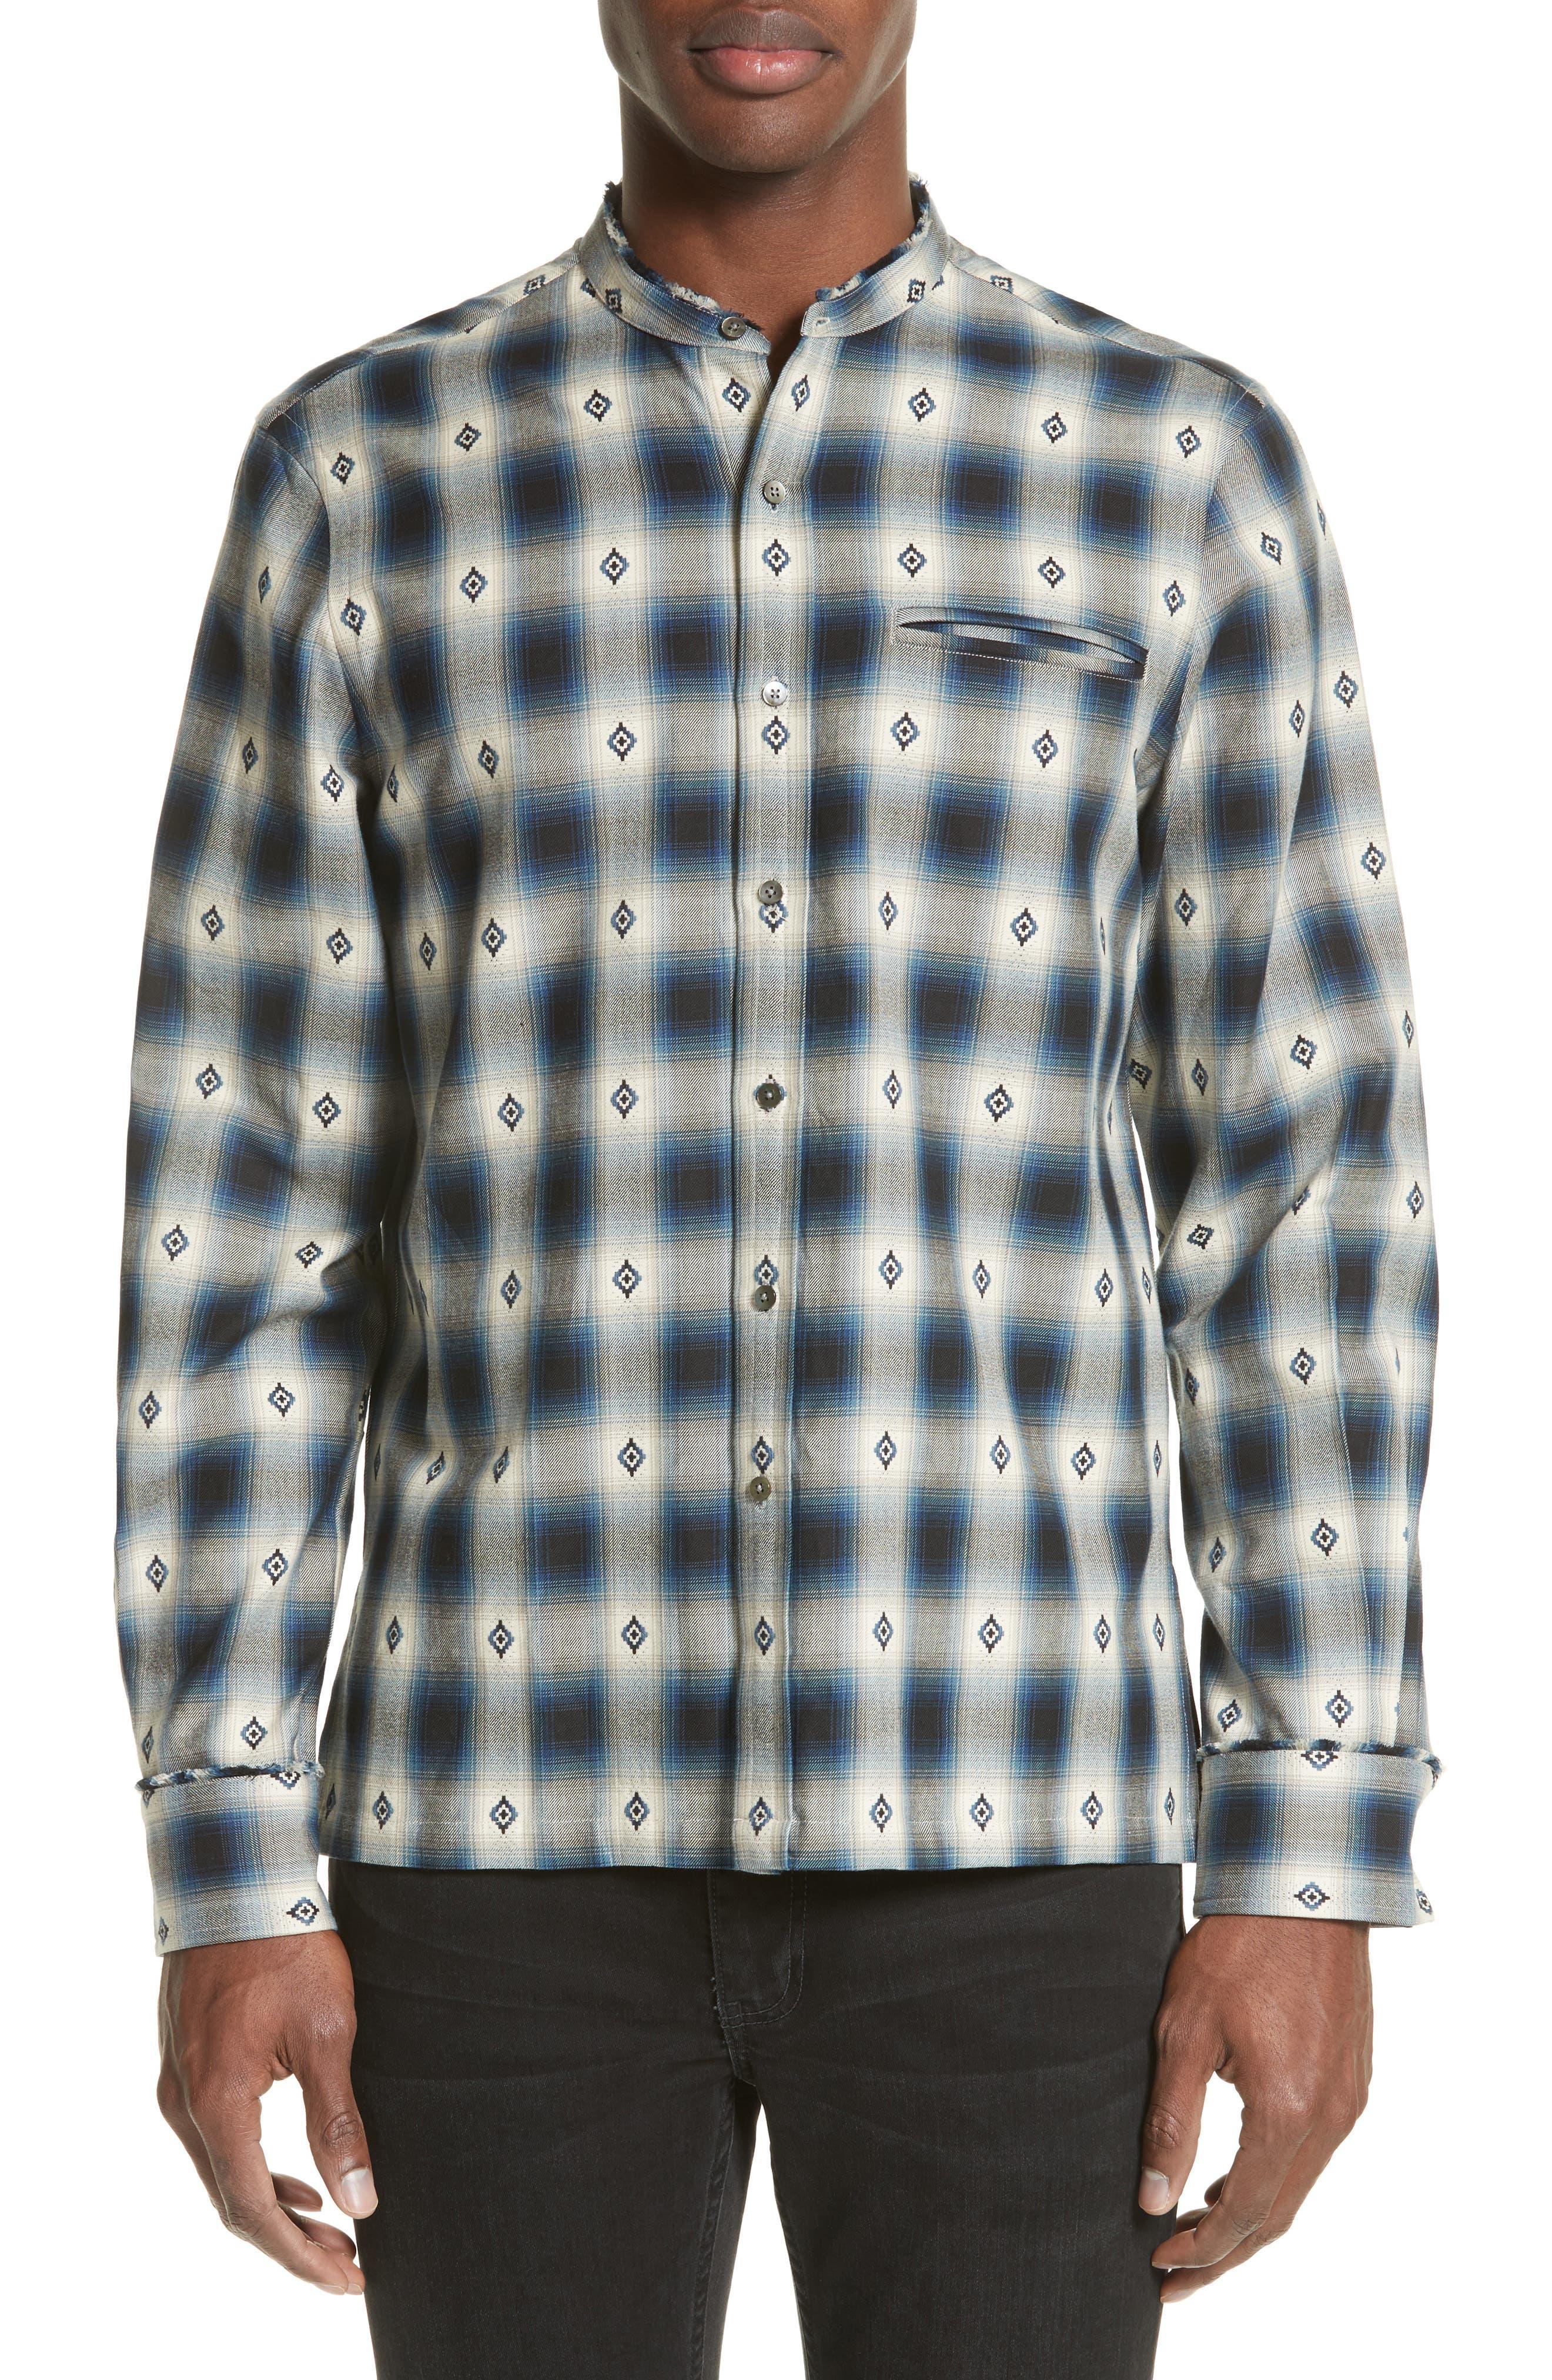 OVADIA & SONS Crosby Raw Edge Print Woven Shirt